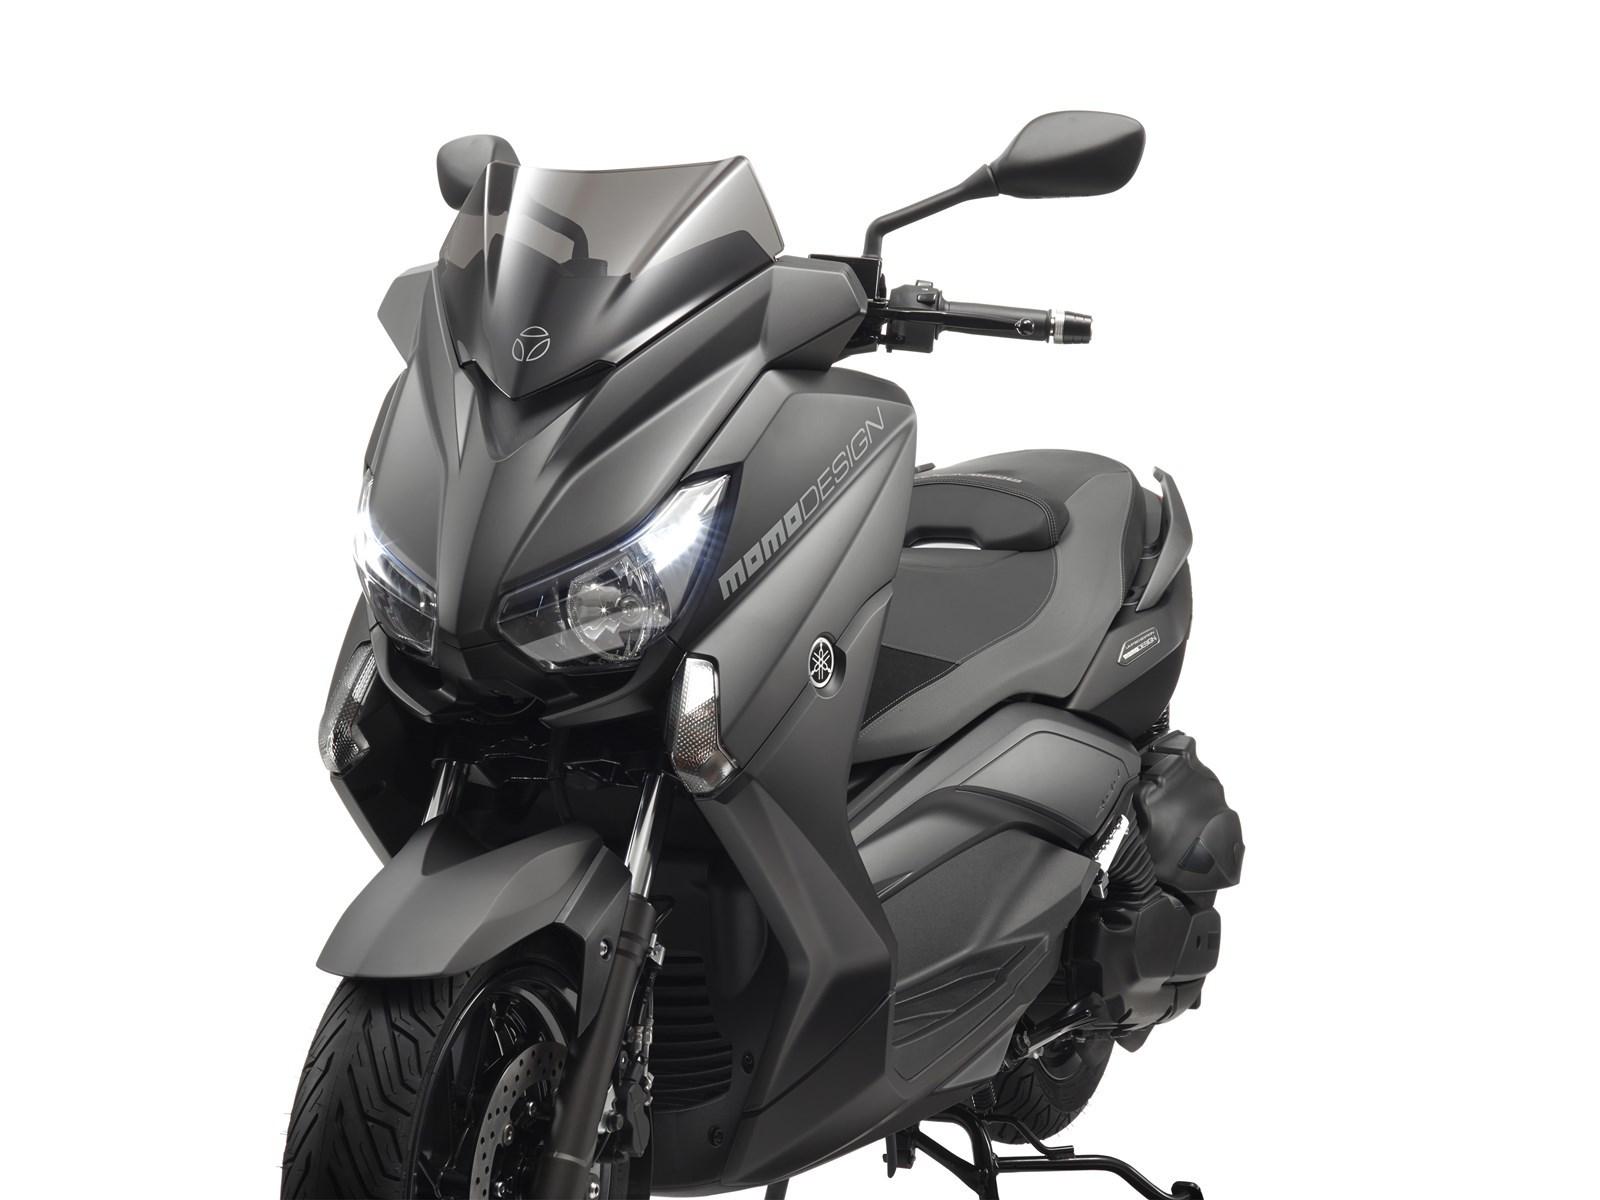 Foto de Yamaha X-MAX 400 MOMODESIGN, estudio y detalles (30/33)